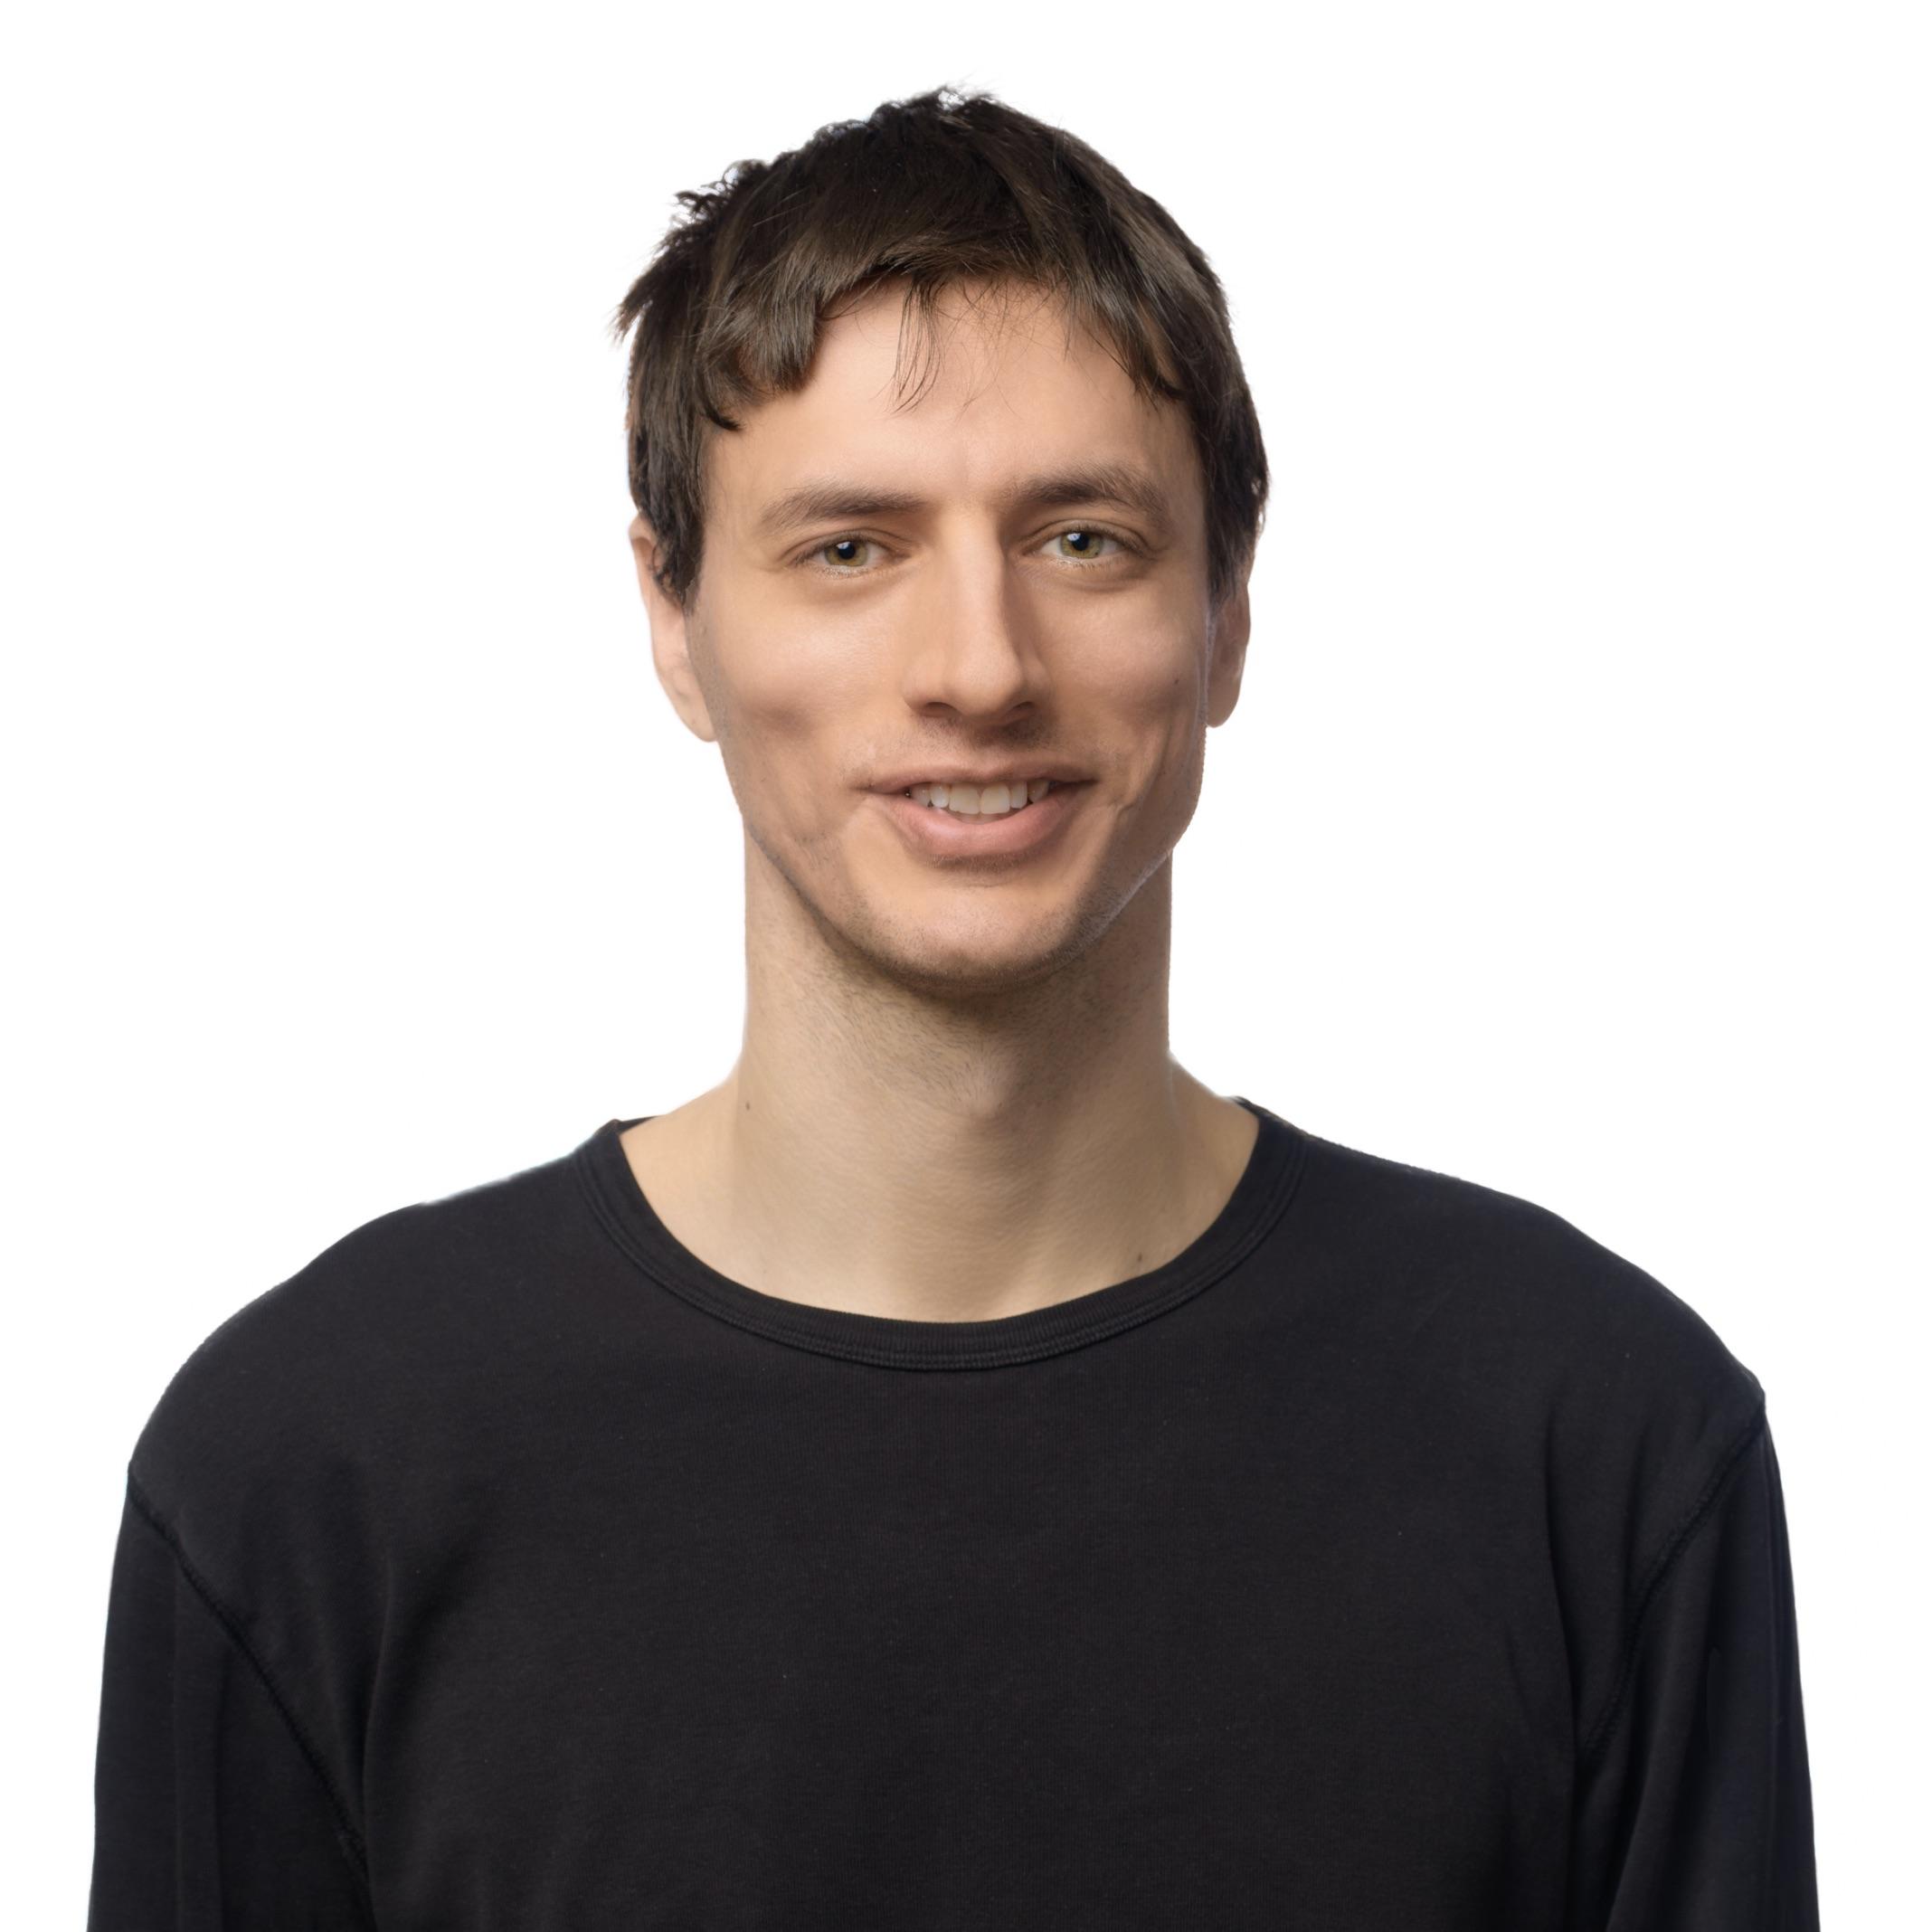 Levi Goertz